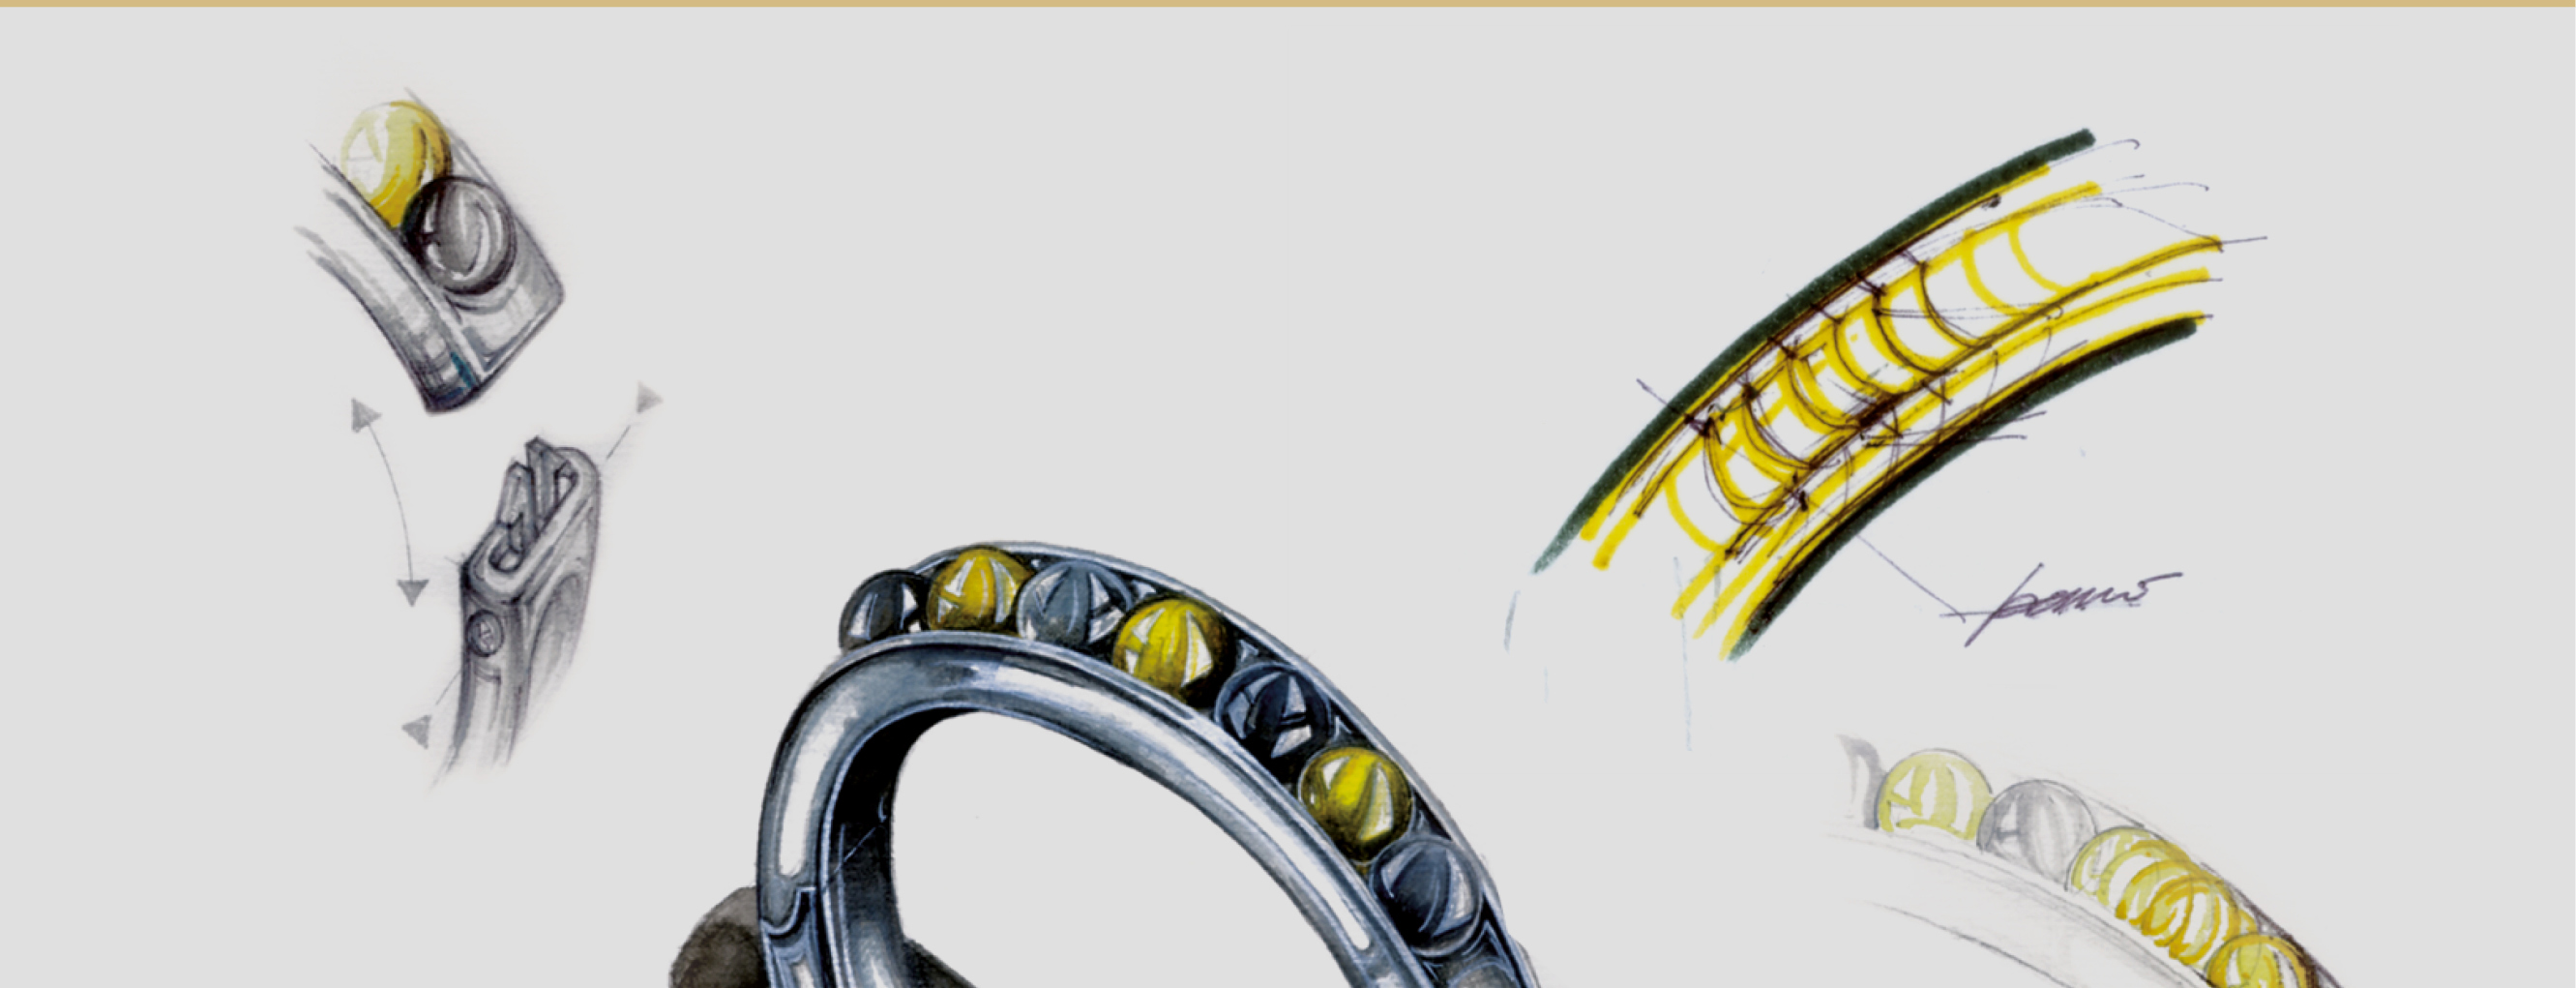 jewellry photos